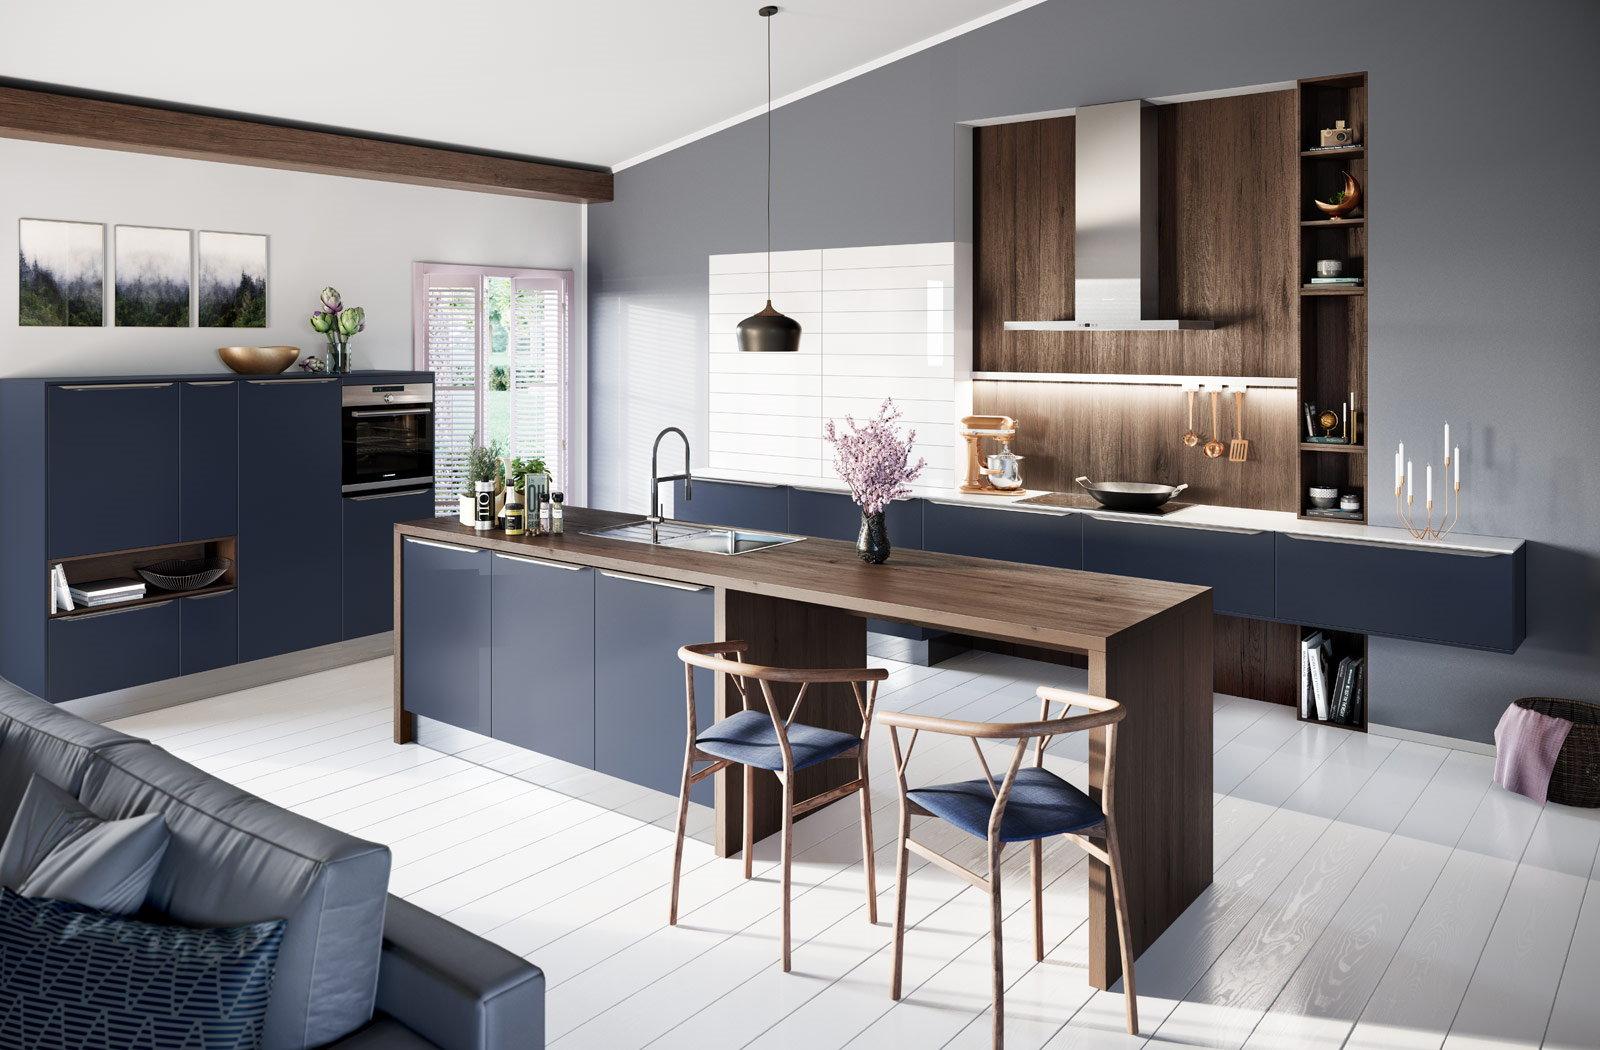 Donkerblauwe keuken met tafel – Häcker keuken 6000, fluweelblauw mat lak